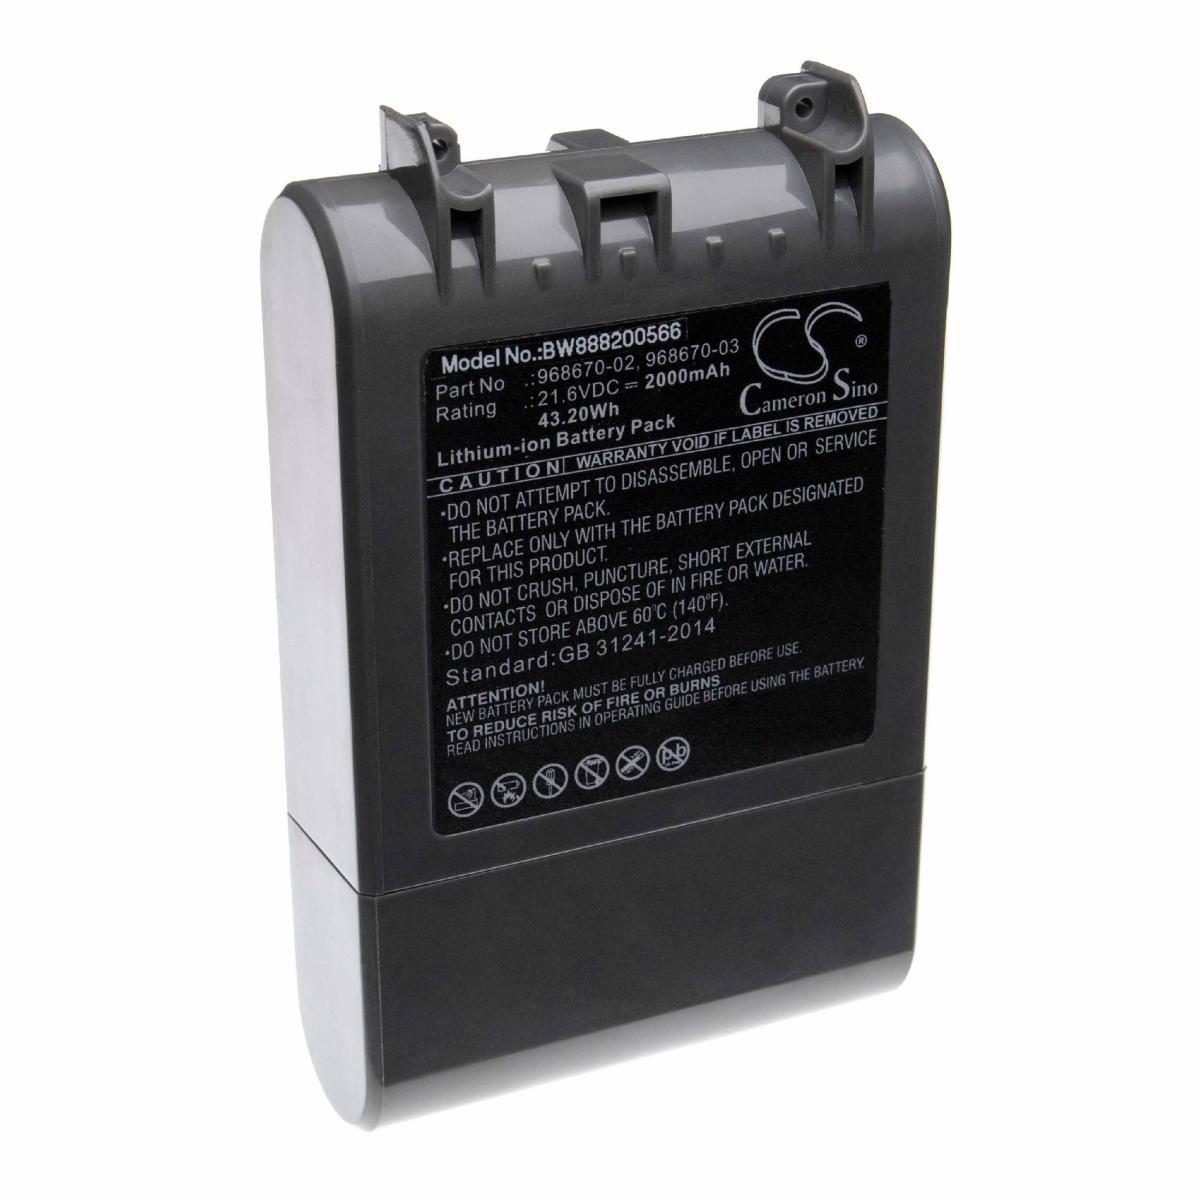 Vhbw vhbw batterie compatible avec Dyson SV11, V7, V7 Motorhead Pro, V7 Motorhead vacuum, V7 Total Clean Home Cleaner (2000mA